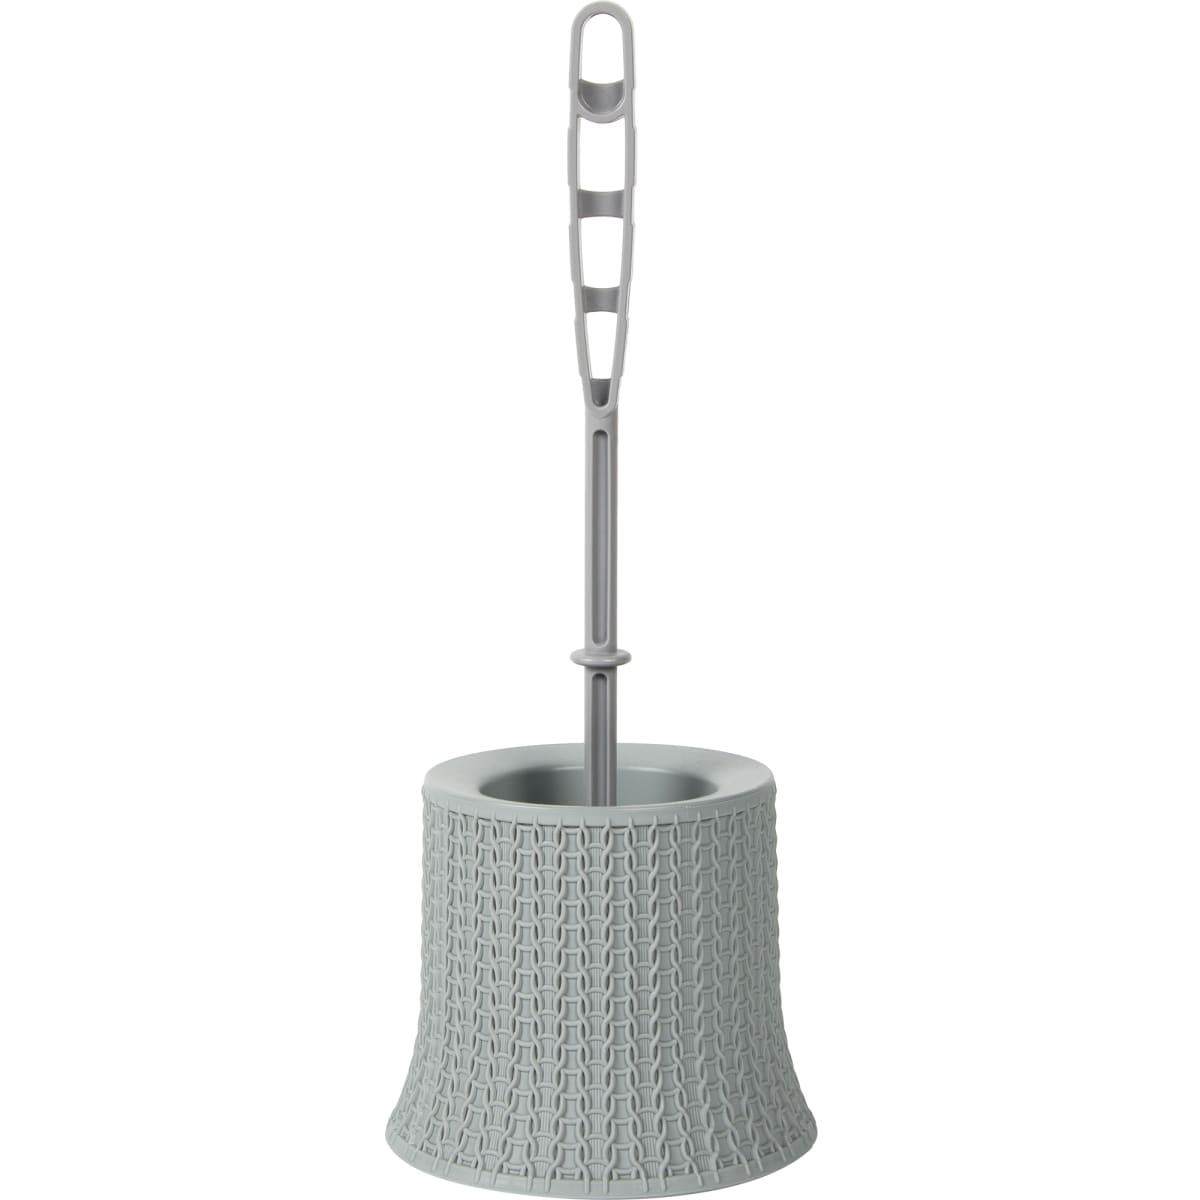 Ёрш для унитаза «Вязание» цвет серый